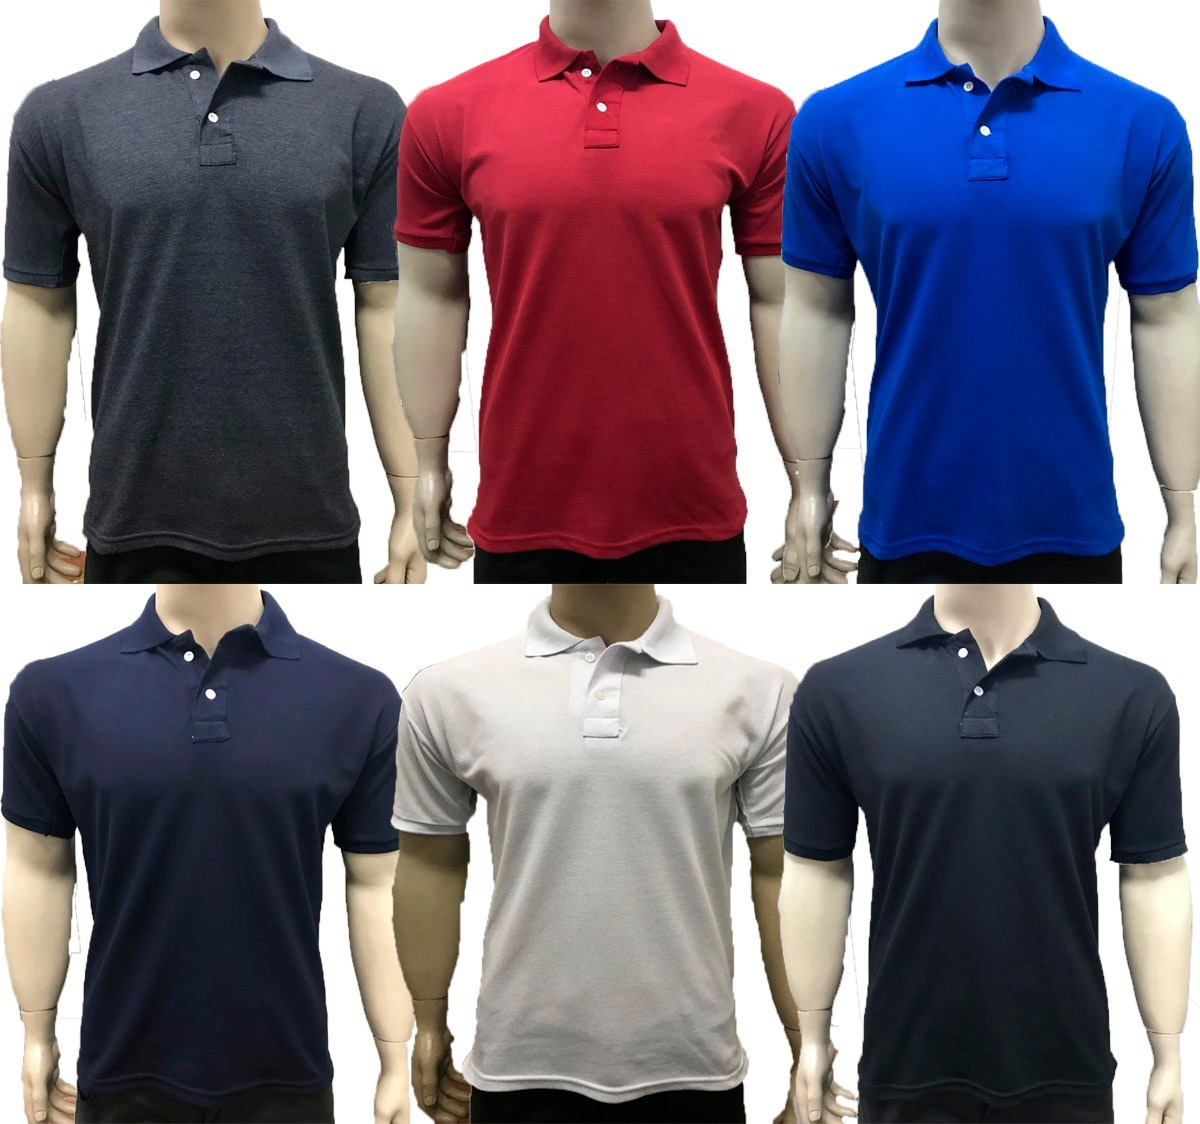 762ab4f92c kit 10 camisas gola polo micro logos atacado revenda lucre. Carregando zoom.